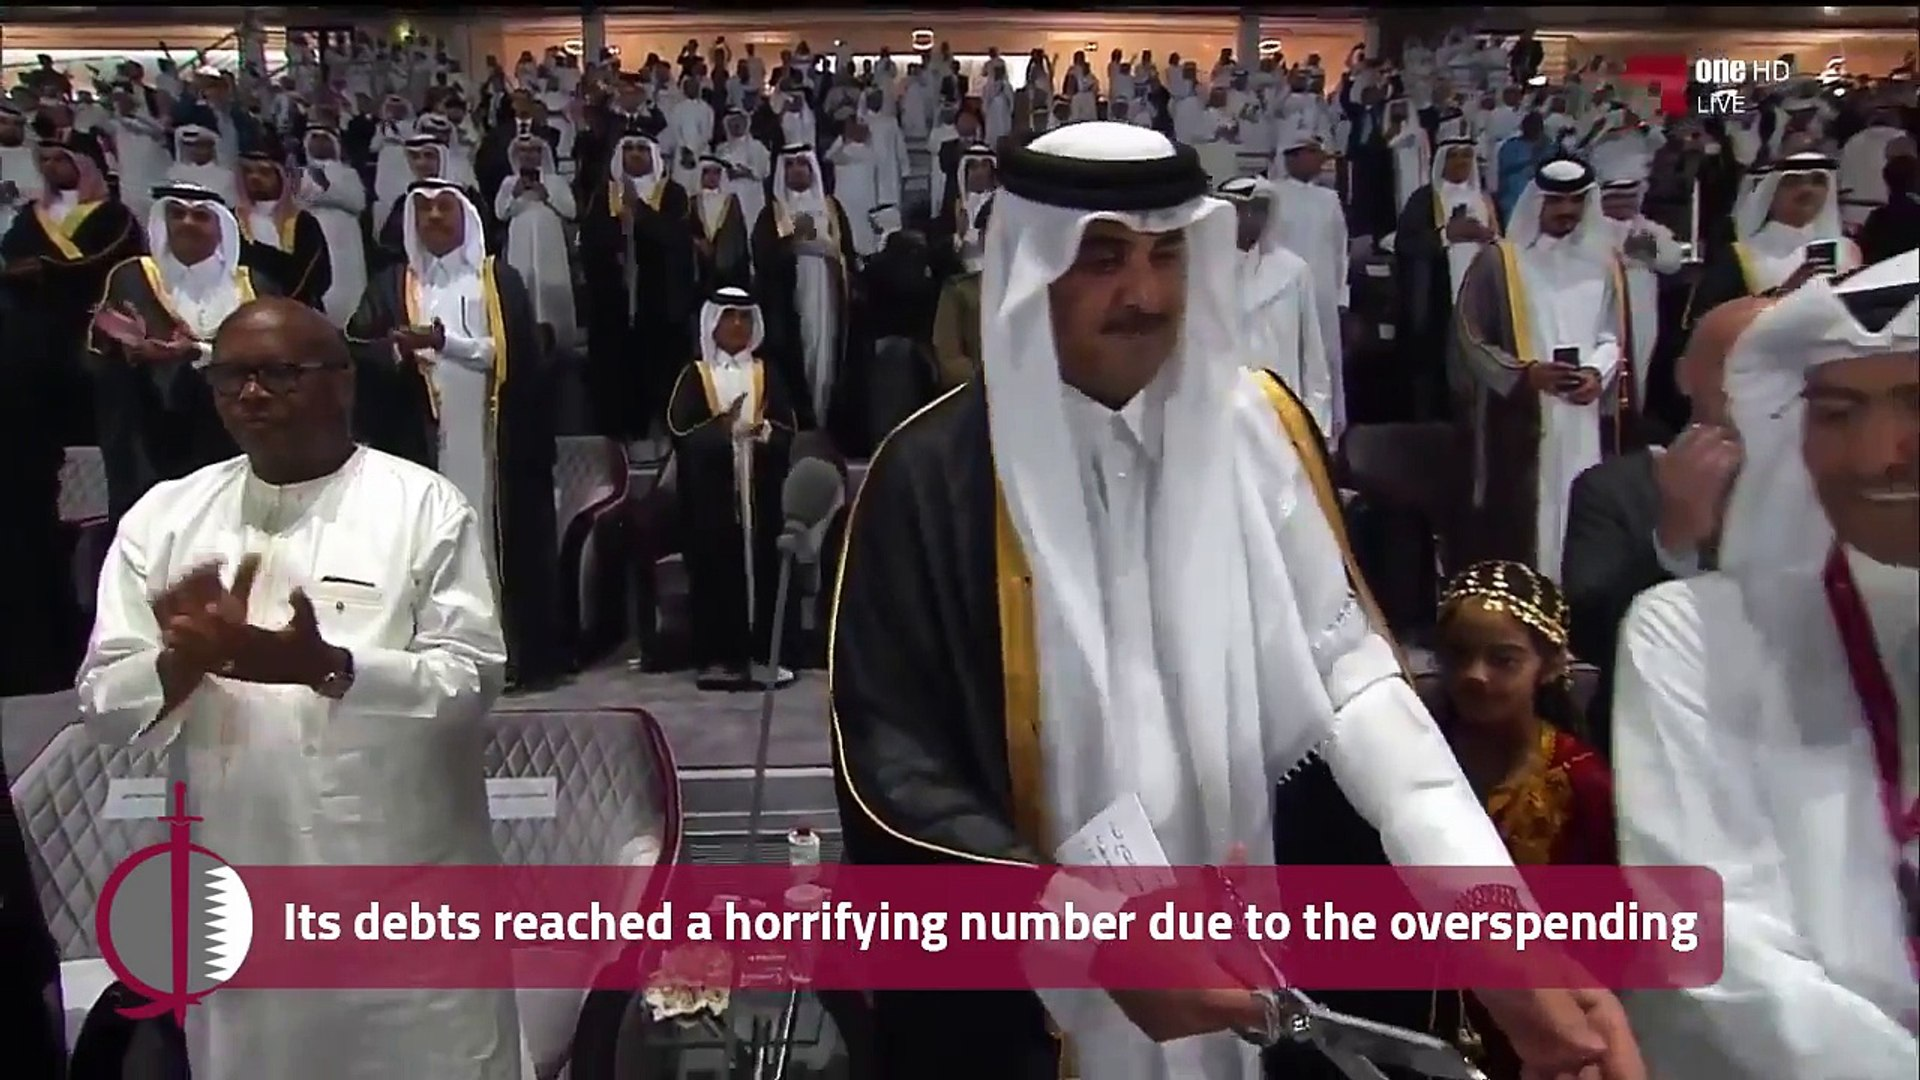 Qatar 2022; the spilt money